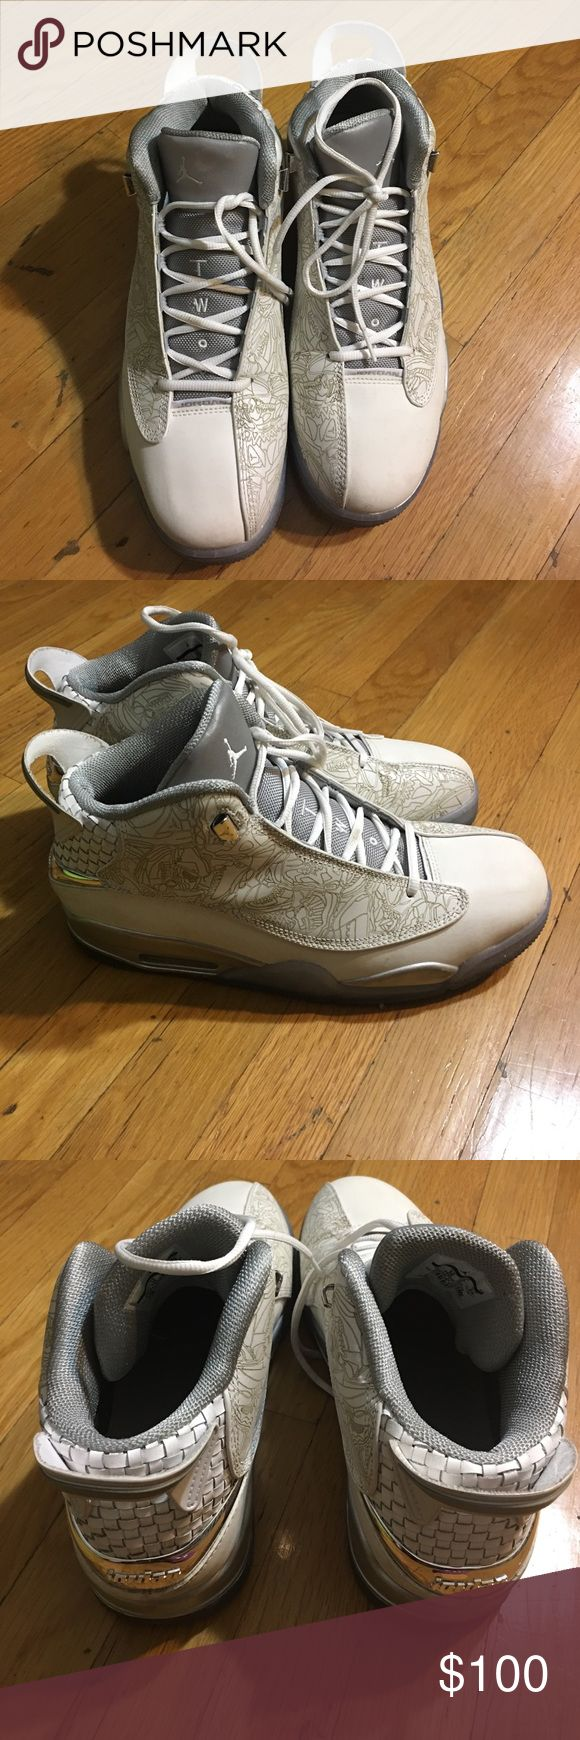 Jordan Dub Zero Sz 11 Great condition Jordan Shoes Sneakers